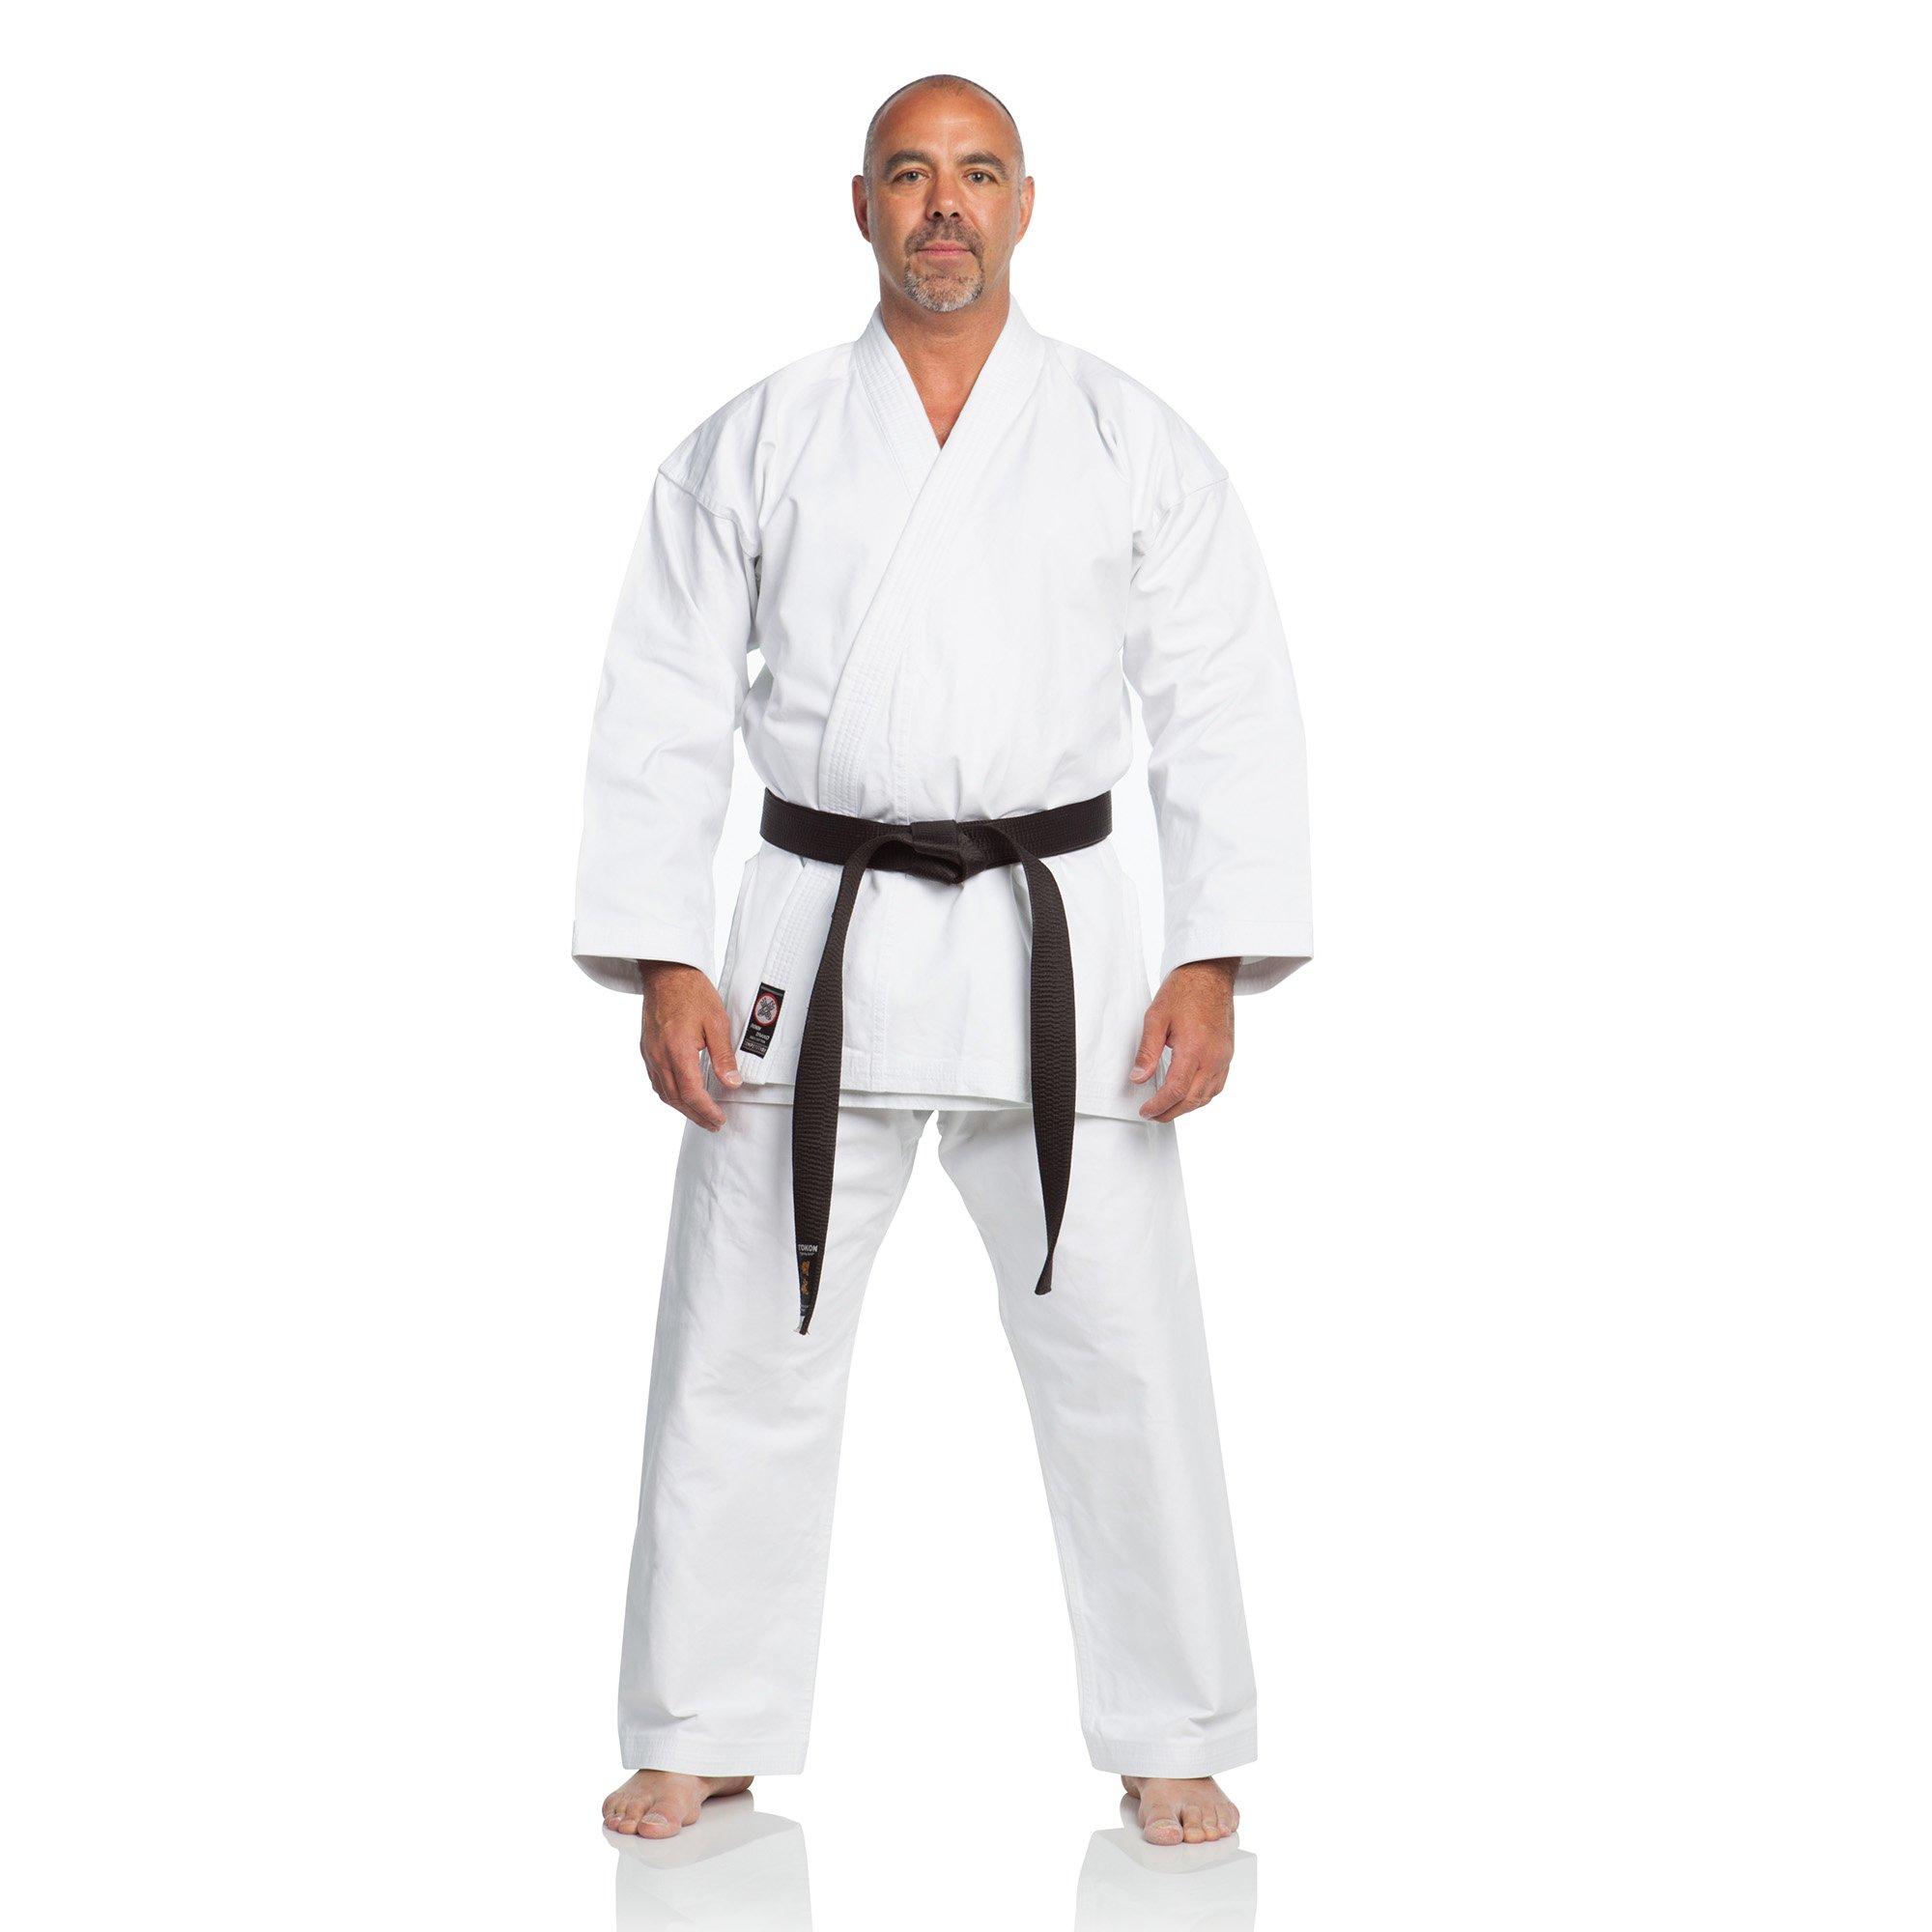 Ronin Brand 12oz. Traditional Heavyweight Karate Uniform (White, 10) by Ronin Brand